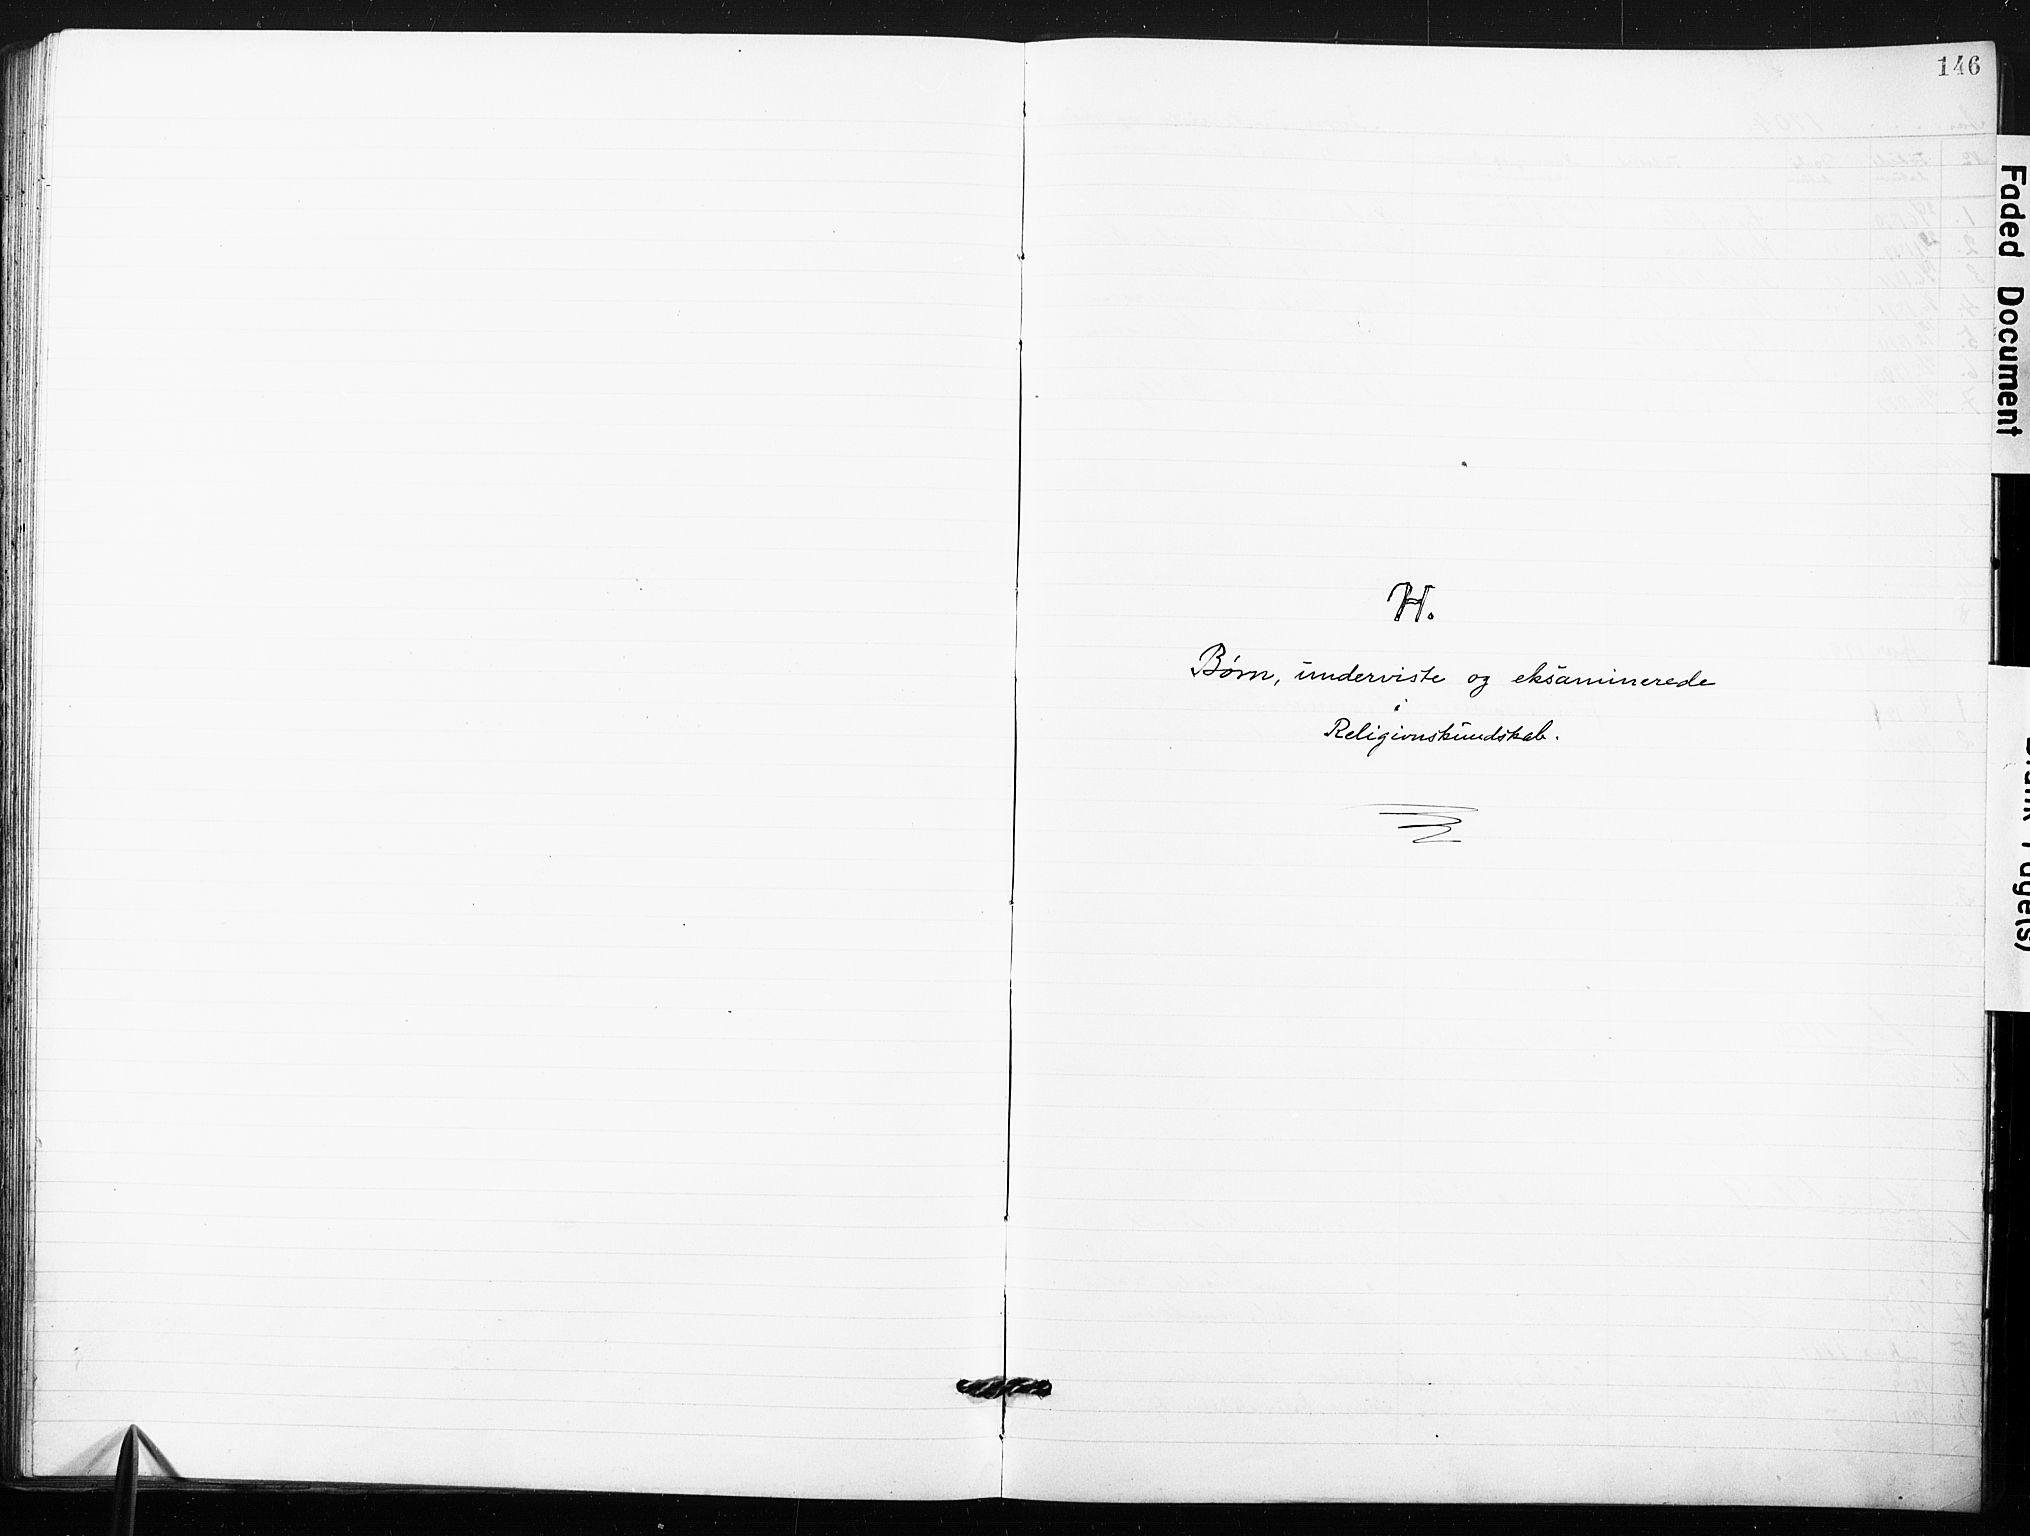 SAO, Kristi menighet Fredrikstad , A/L0002: Dissenterprotokoll nr. 2, 1904-1932, s. 146